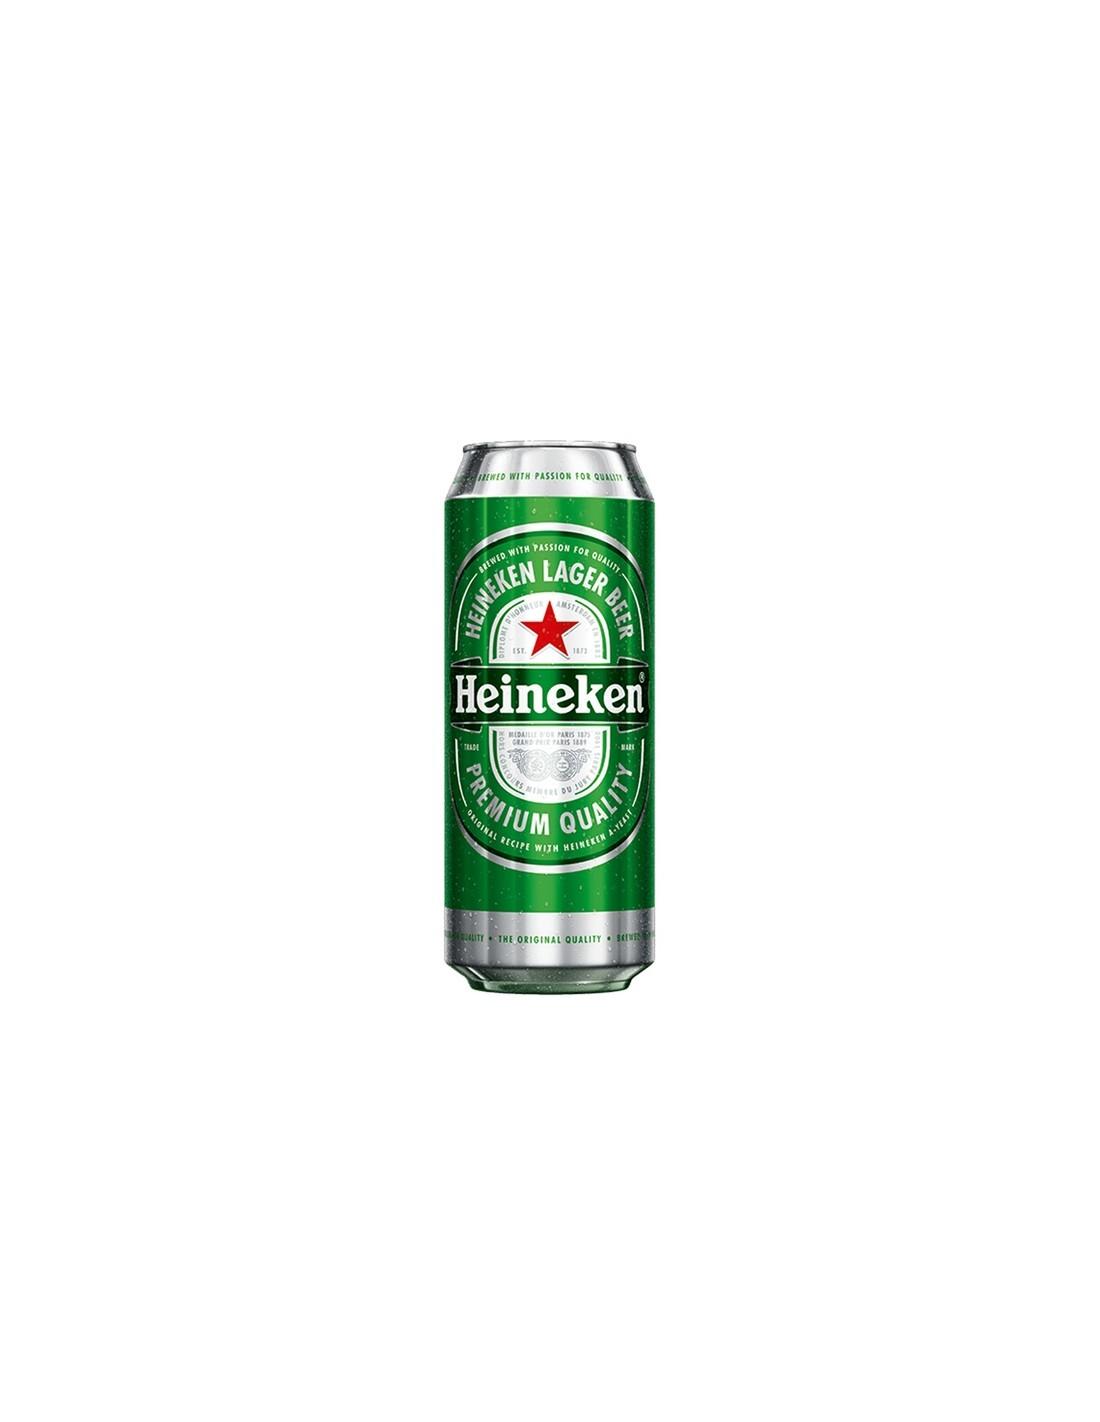 Bere blonda, filtrata Heineken Premium, 5% alc., 0.5L